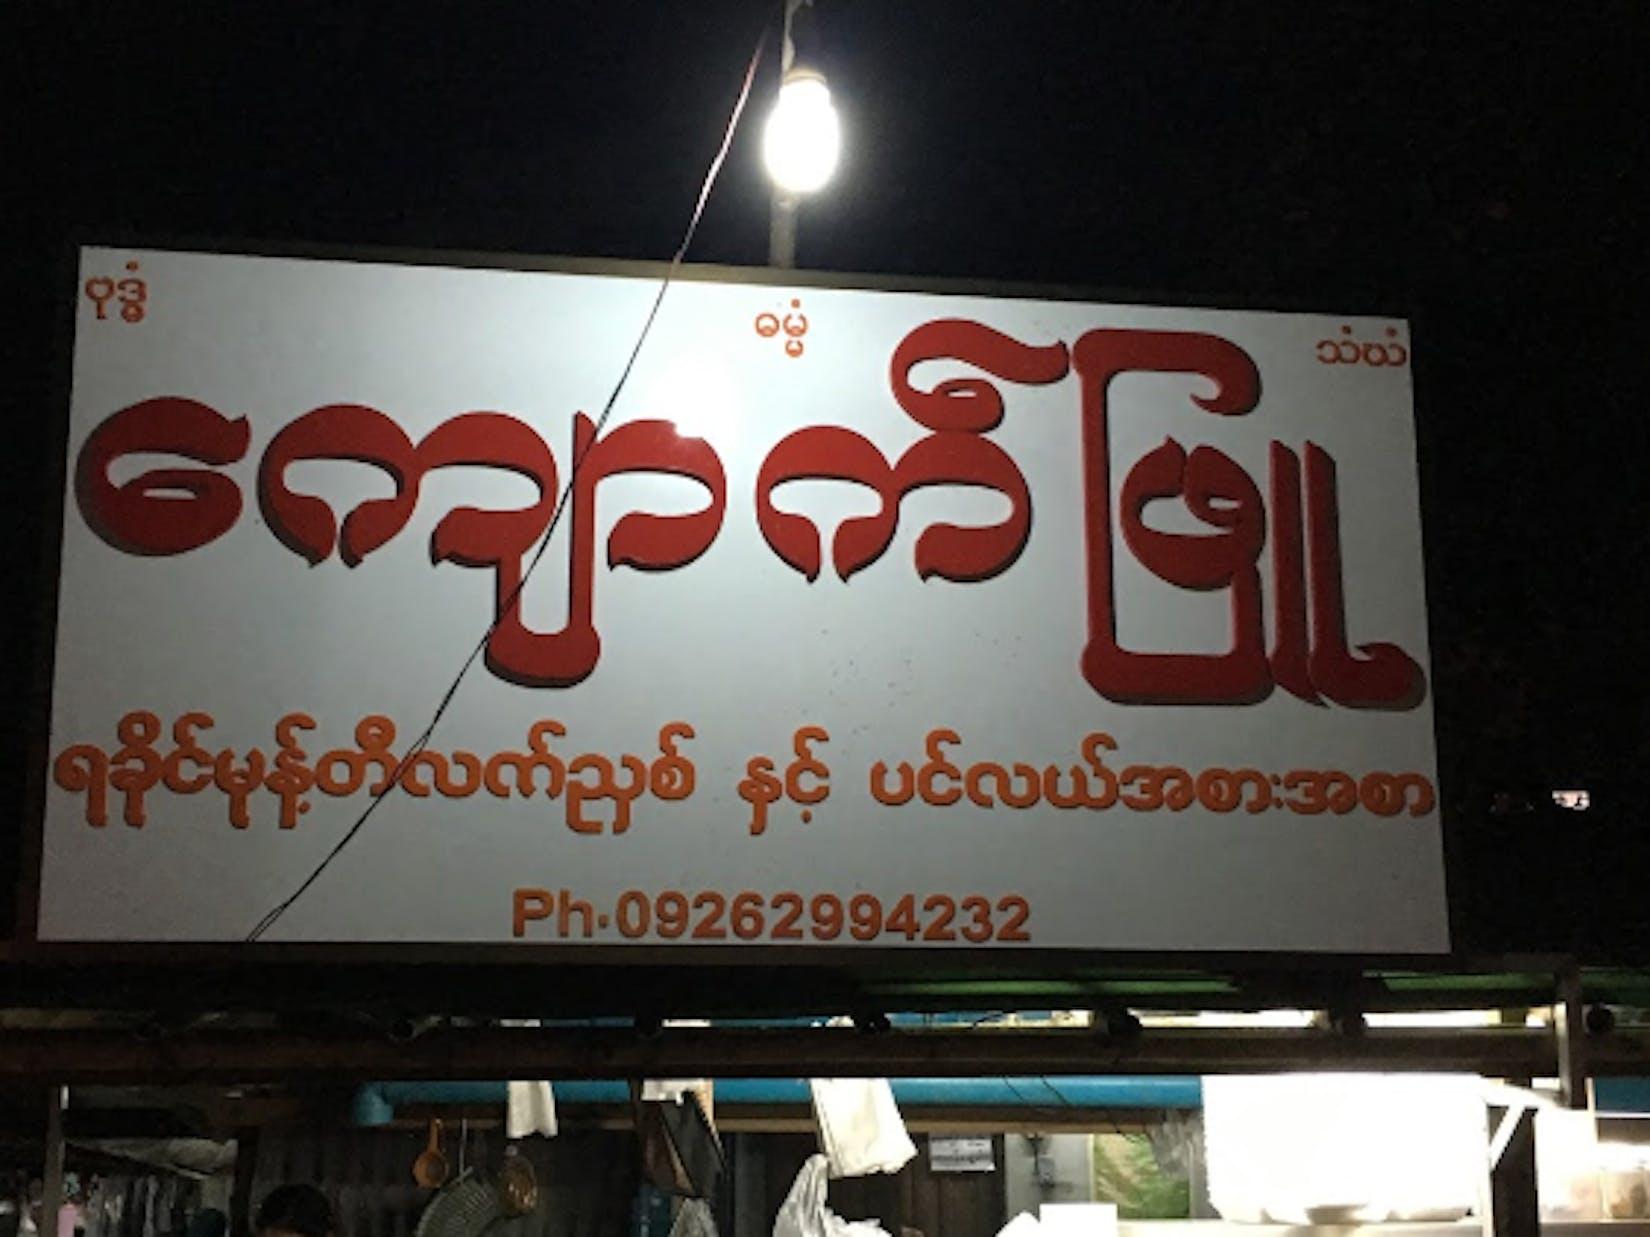 Kyauk Phyu (Seafood) | yathar